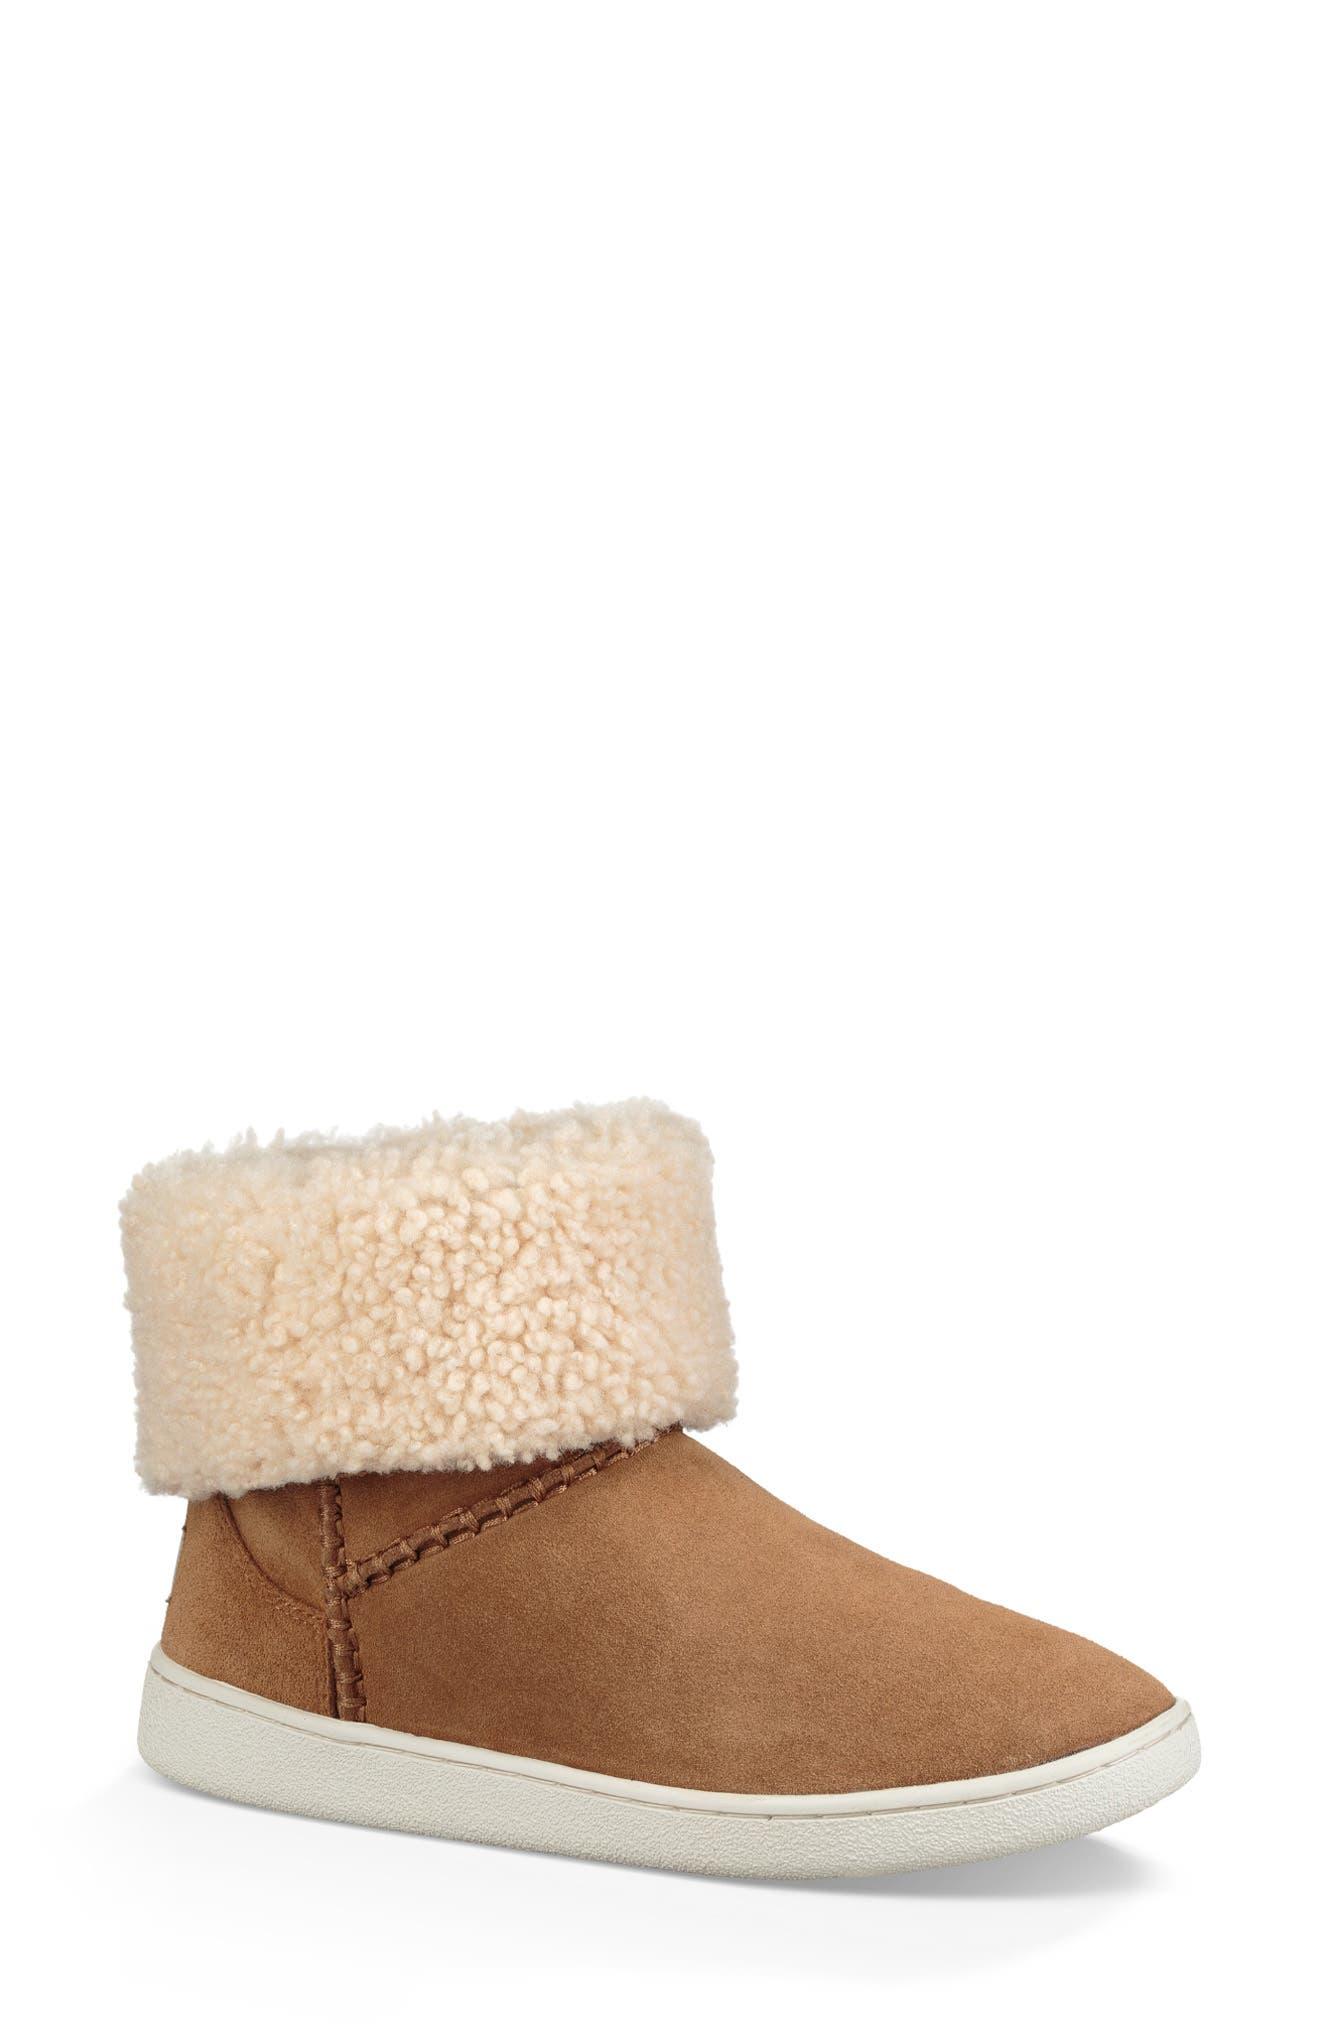 8cceab14e284 ... discount ugg mika classic genuine shearling sneaker women 23296 42128